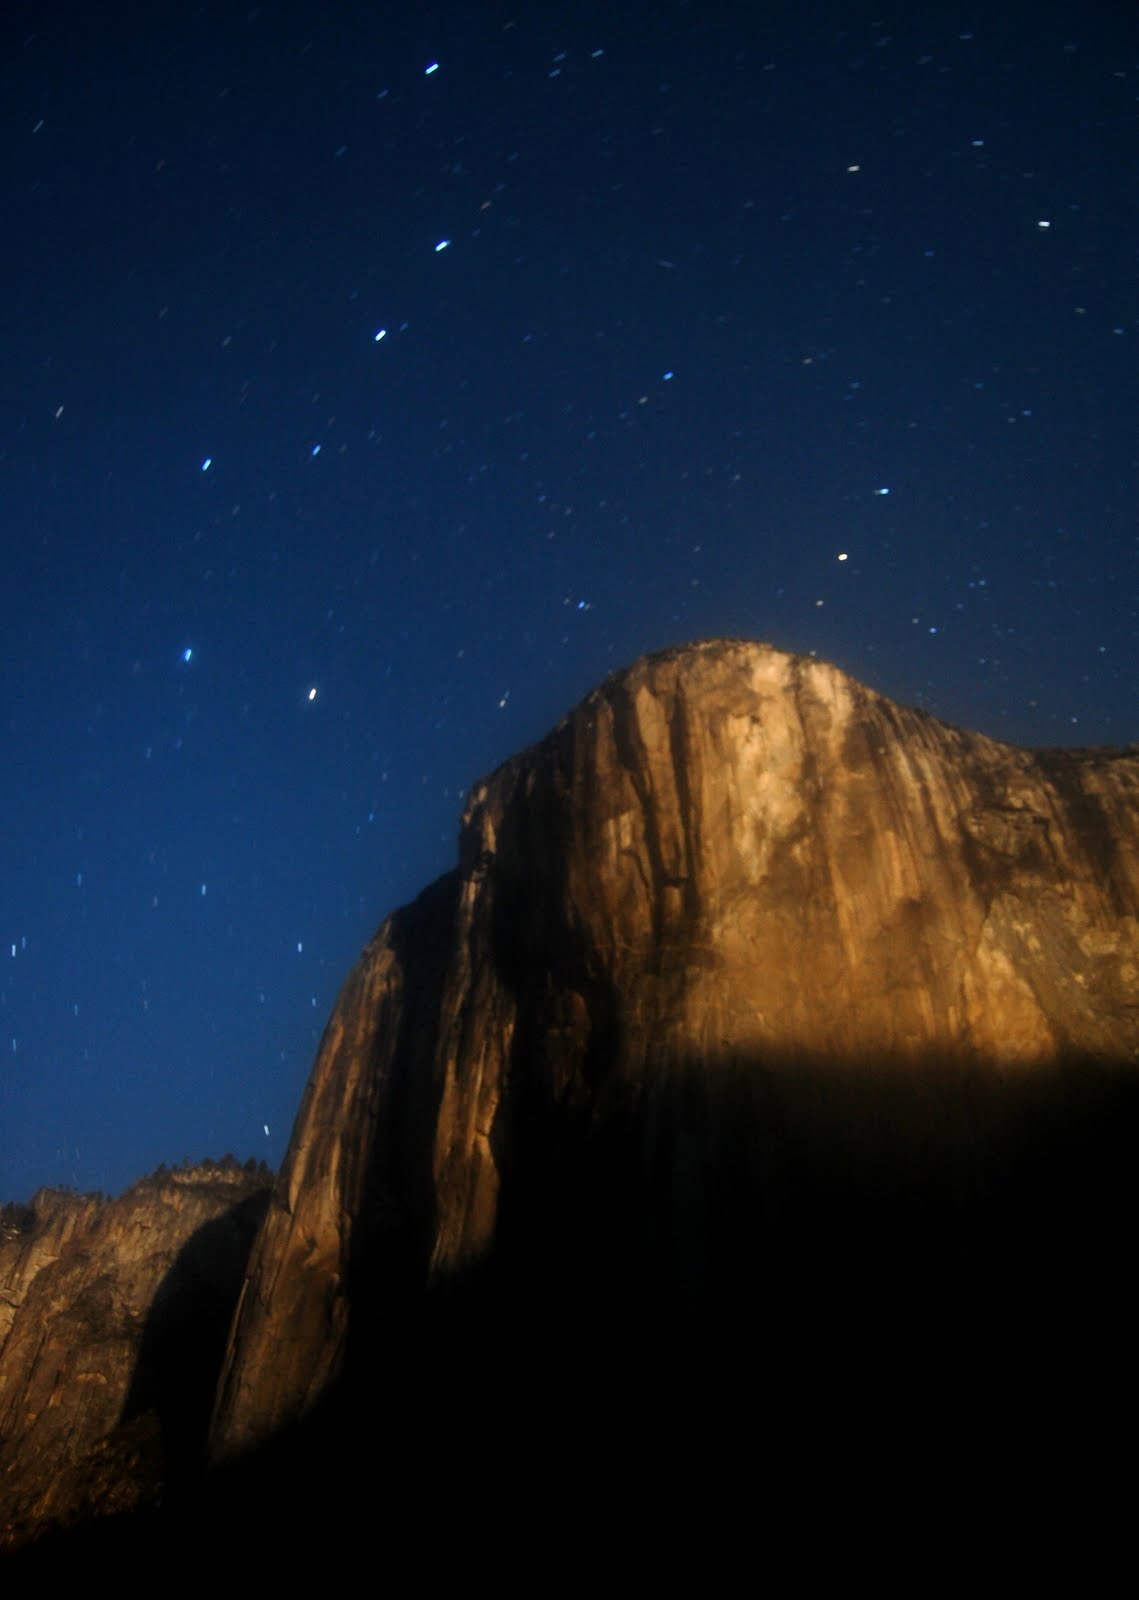 Salathe - El Capitan, Yosemite - vidmoonco